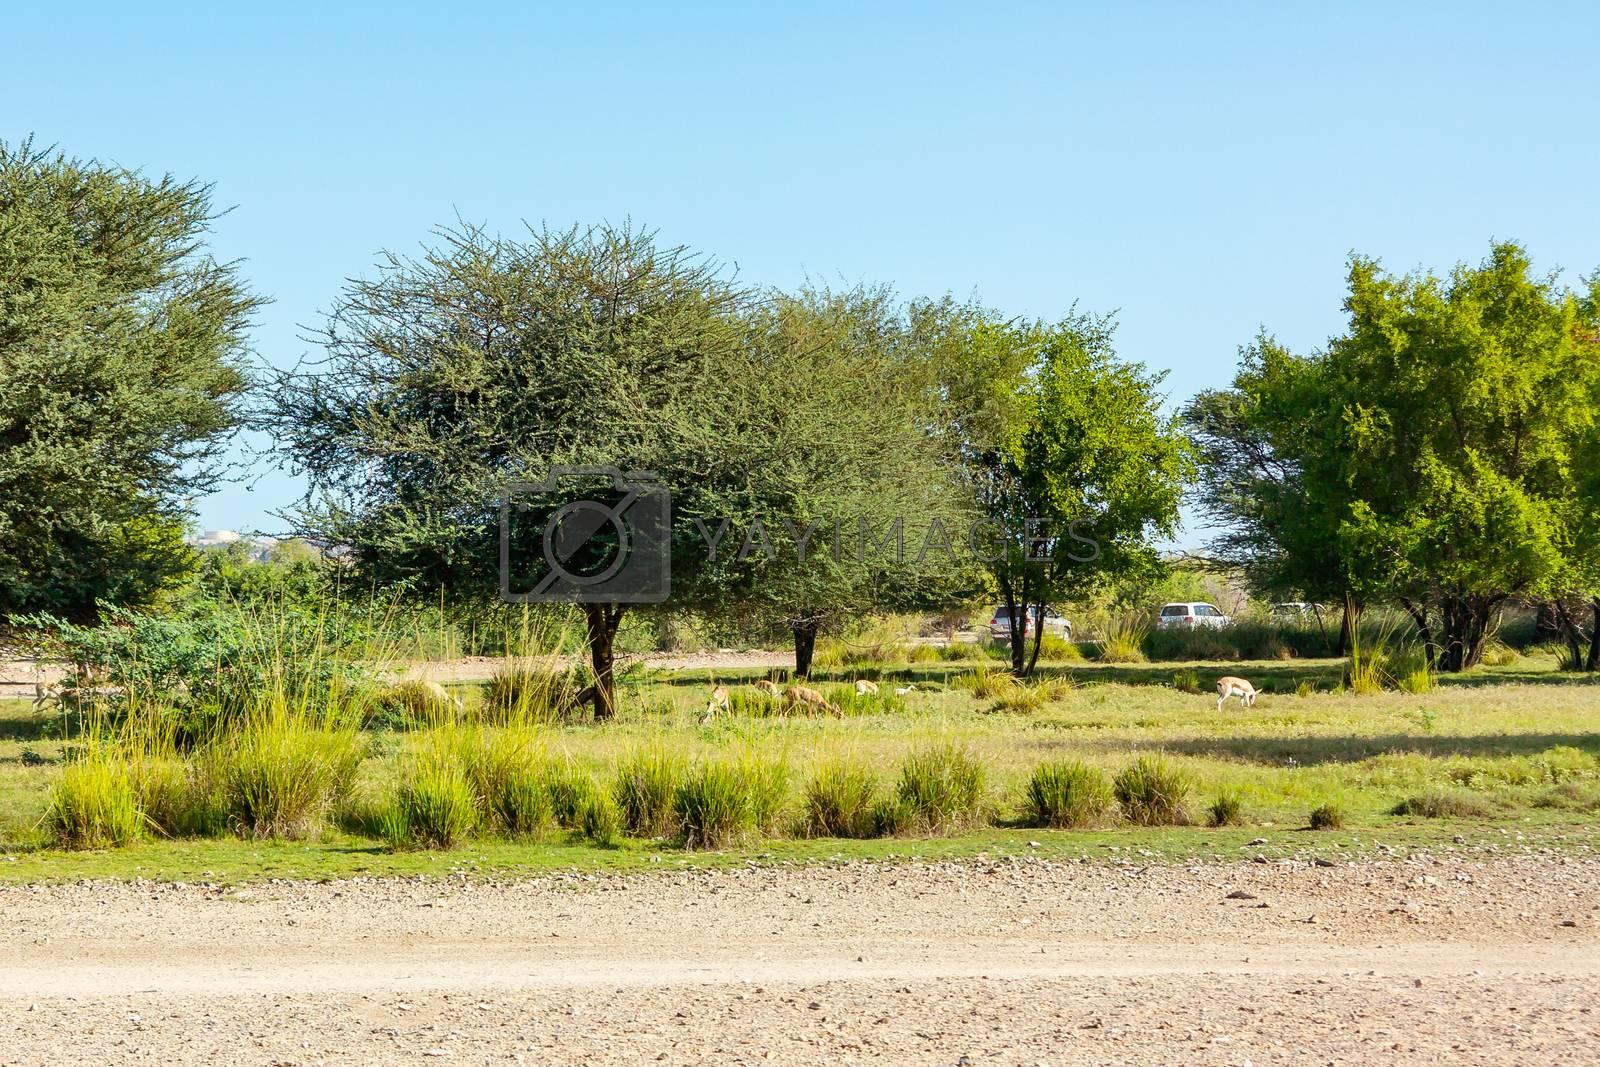 Road to Safari Park on Sir Bani Yas Island, Abu Dhabi, United Arab Emirates by galsand